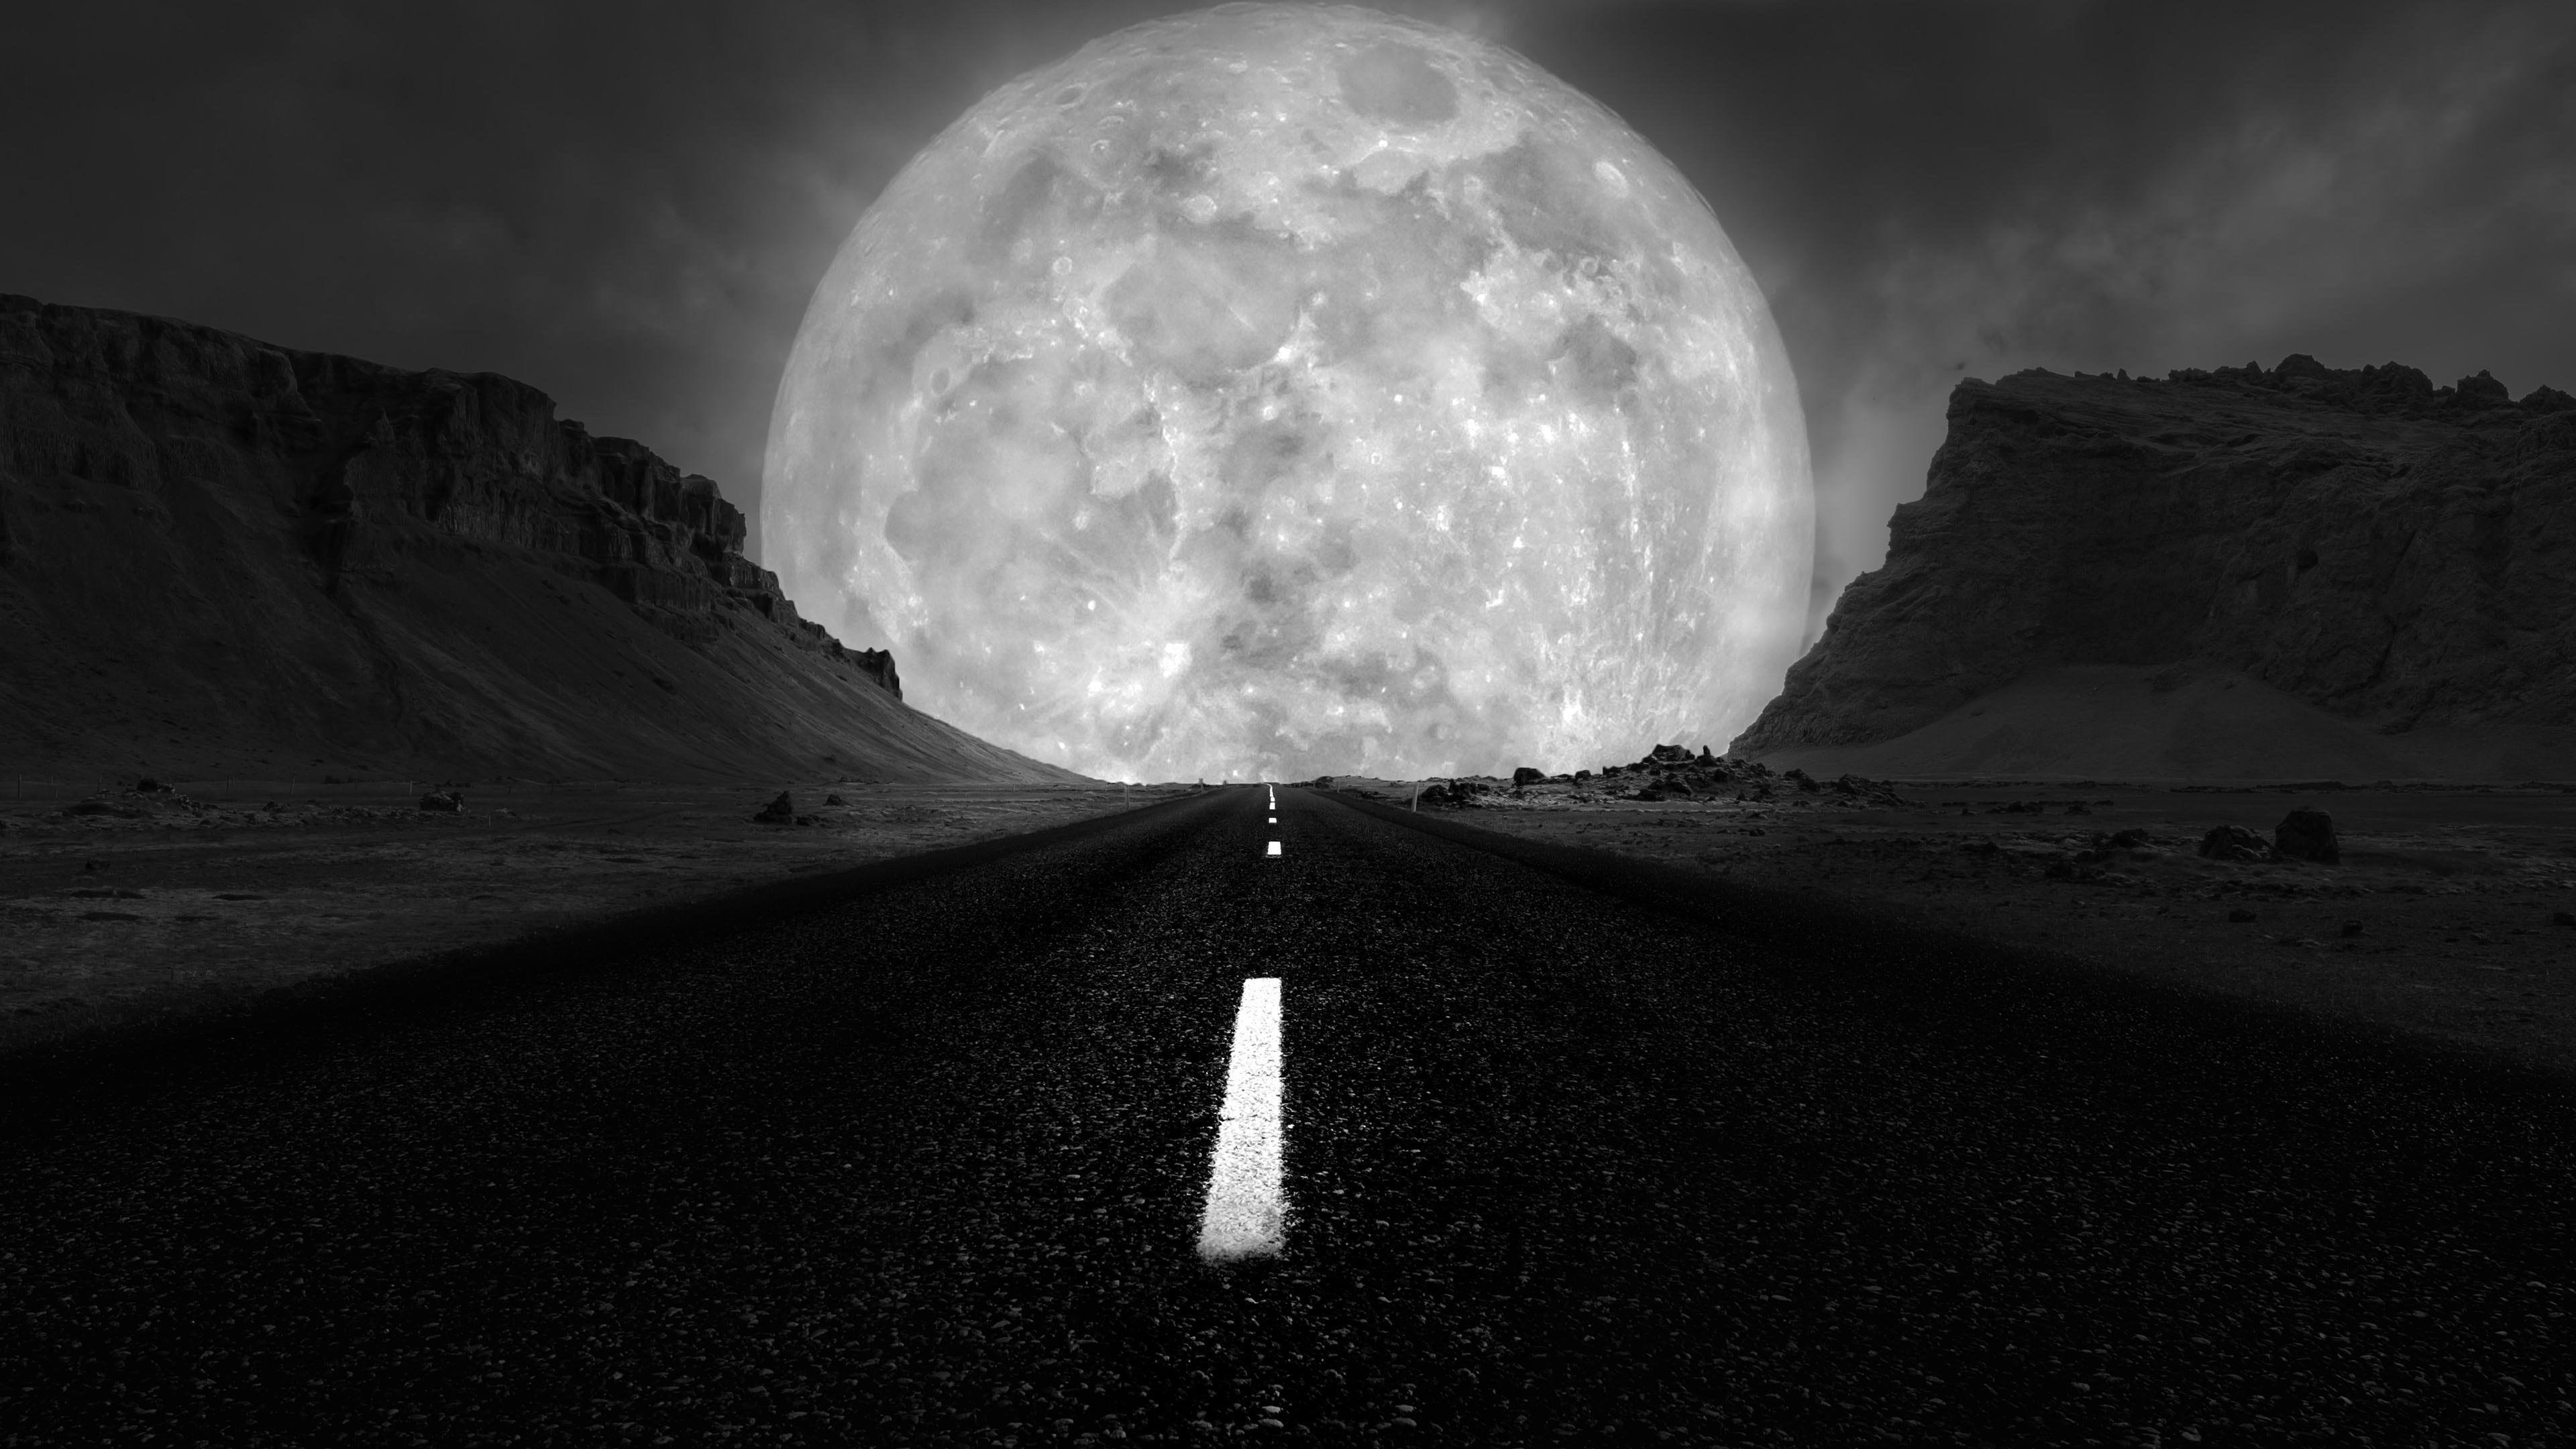 Wallpaper Black Nature Black And White Sky Full Moon In 2021 Hd Wallpaper Wallpaper Gallery Dark Wallpaper